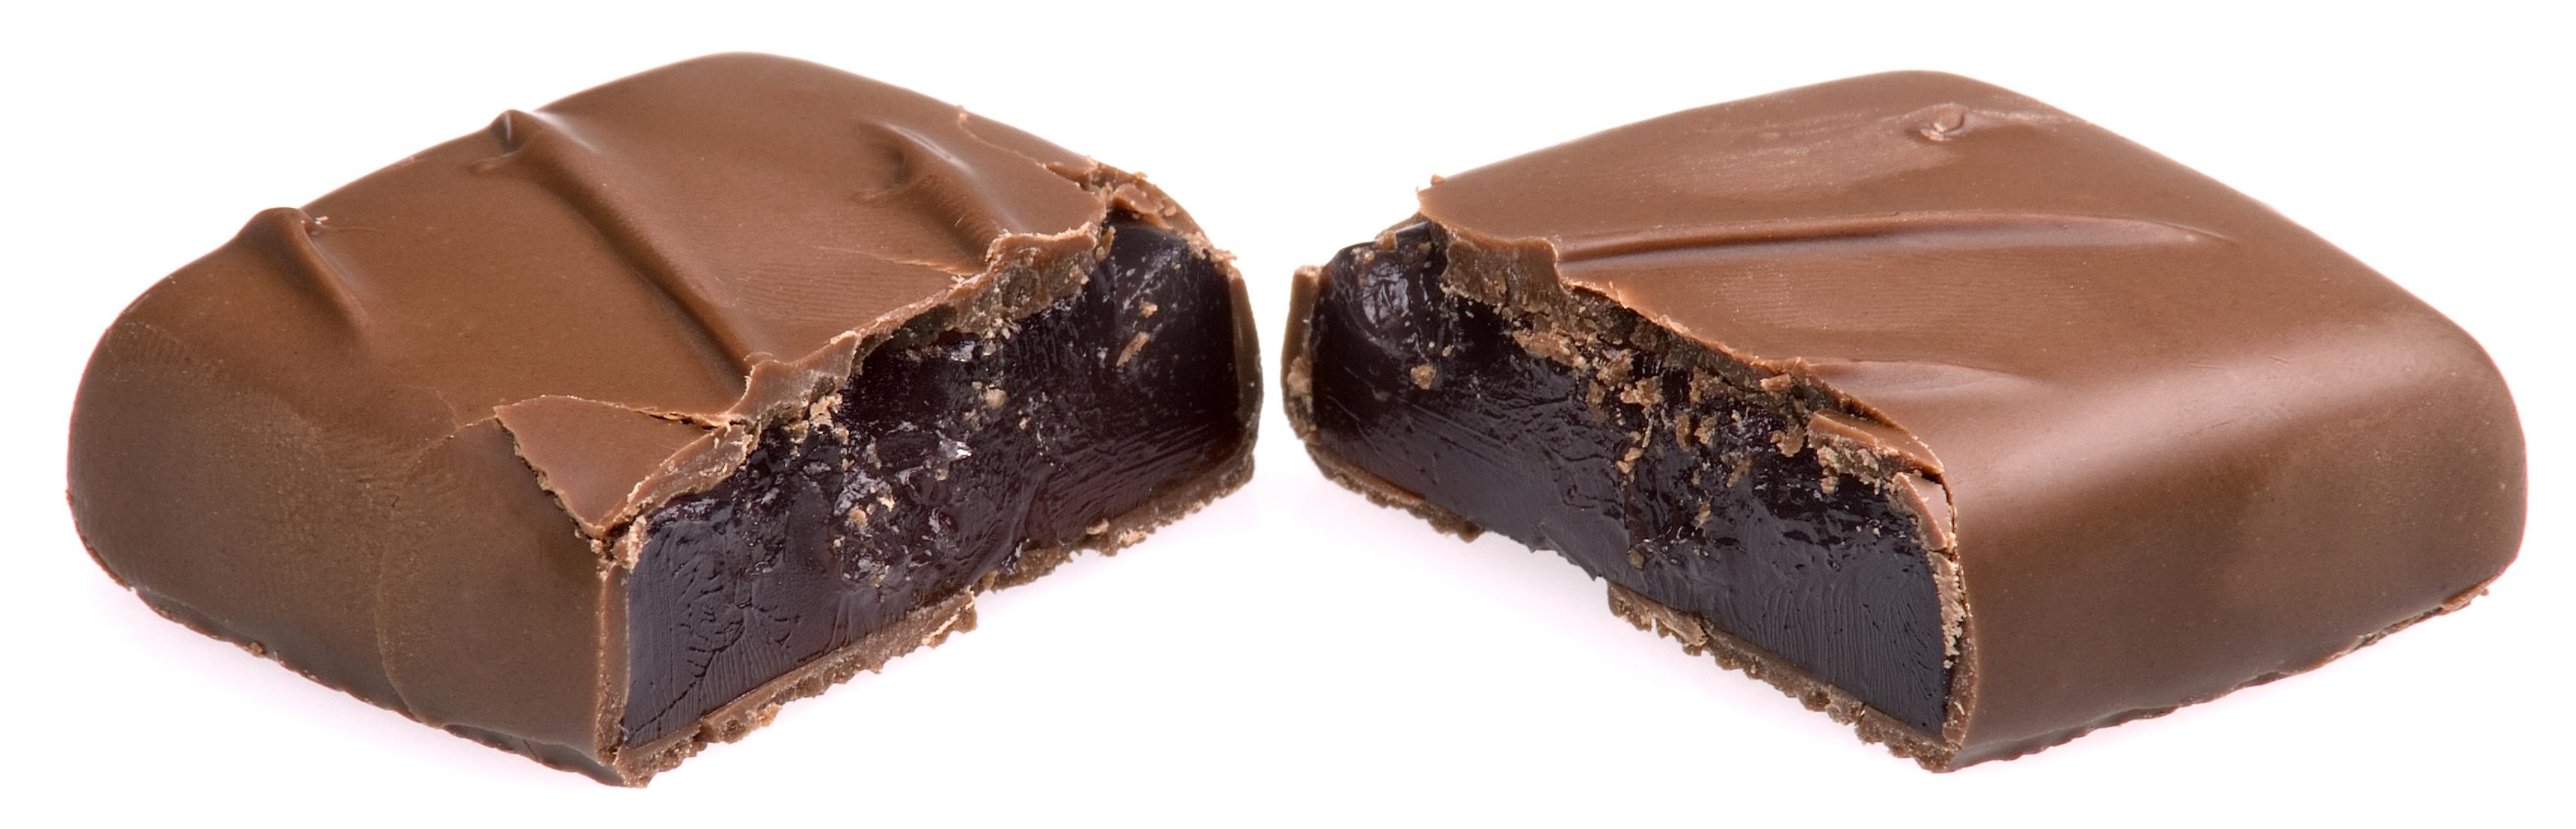 Delight Chocolate Bar S